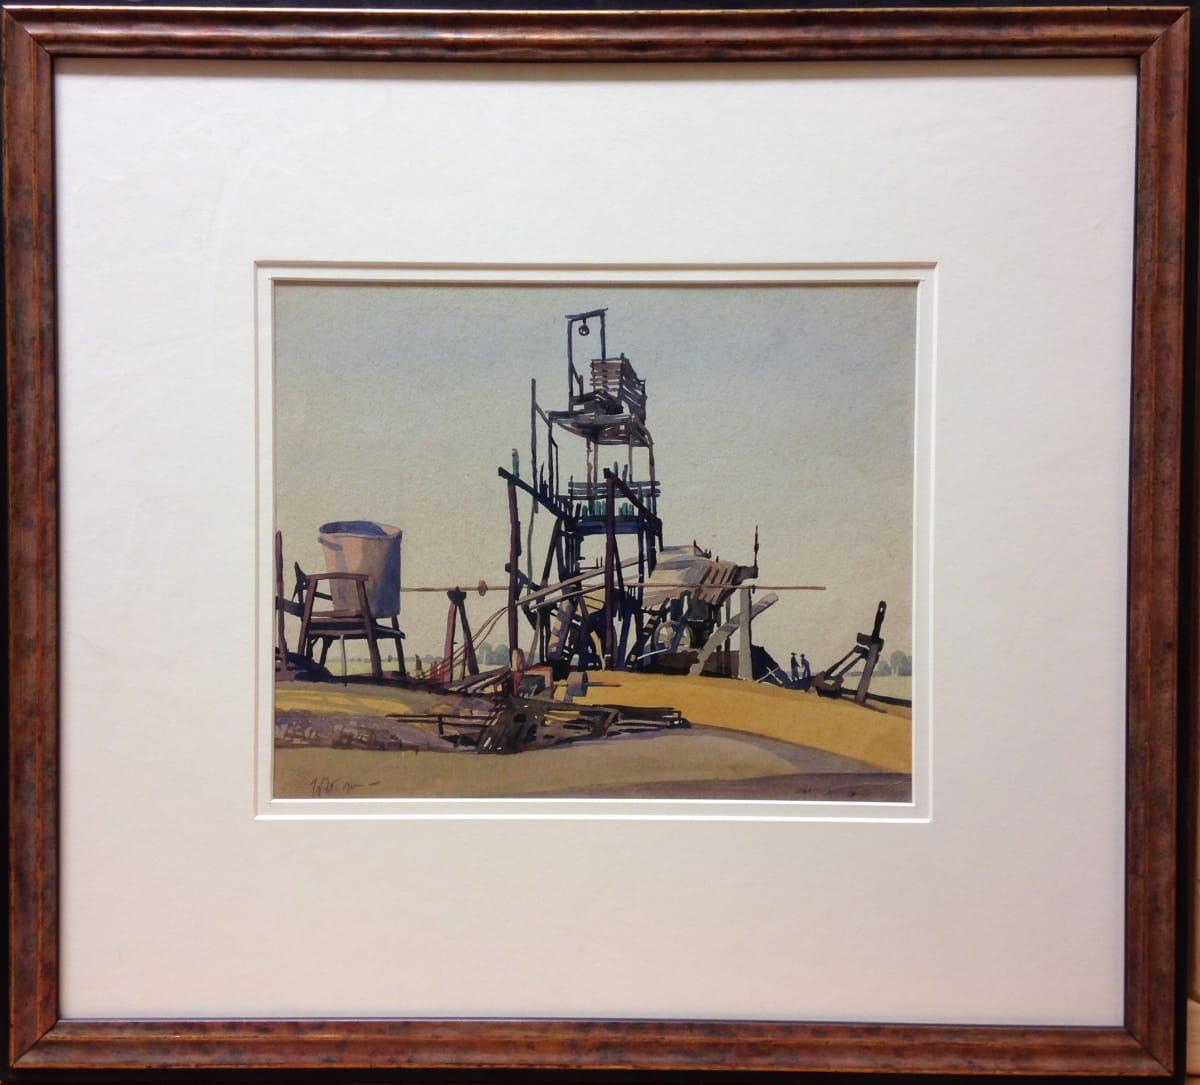 1032 - Old Mine II by Llewellyn Petley-Jones (1908-1986)